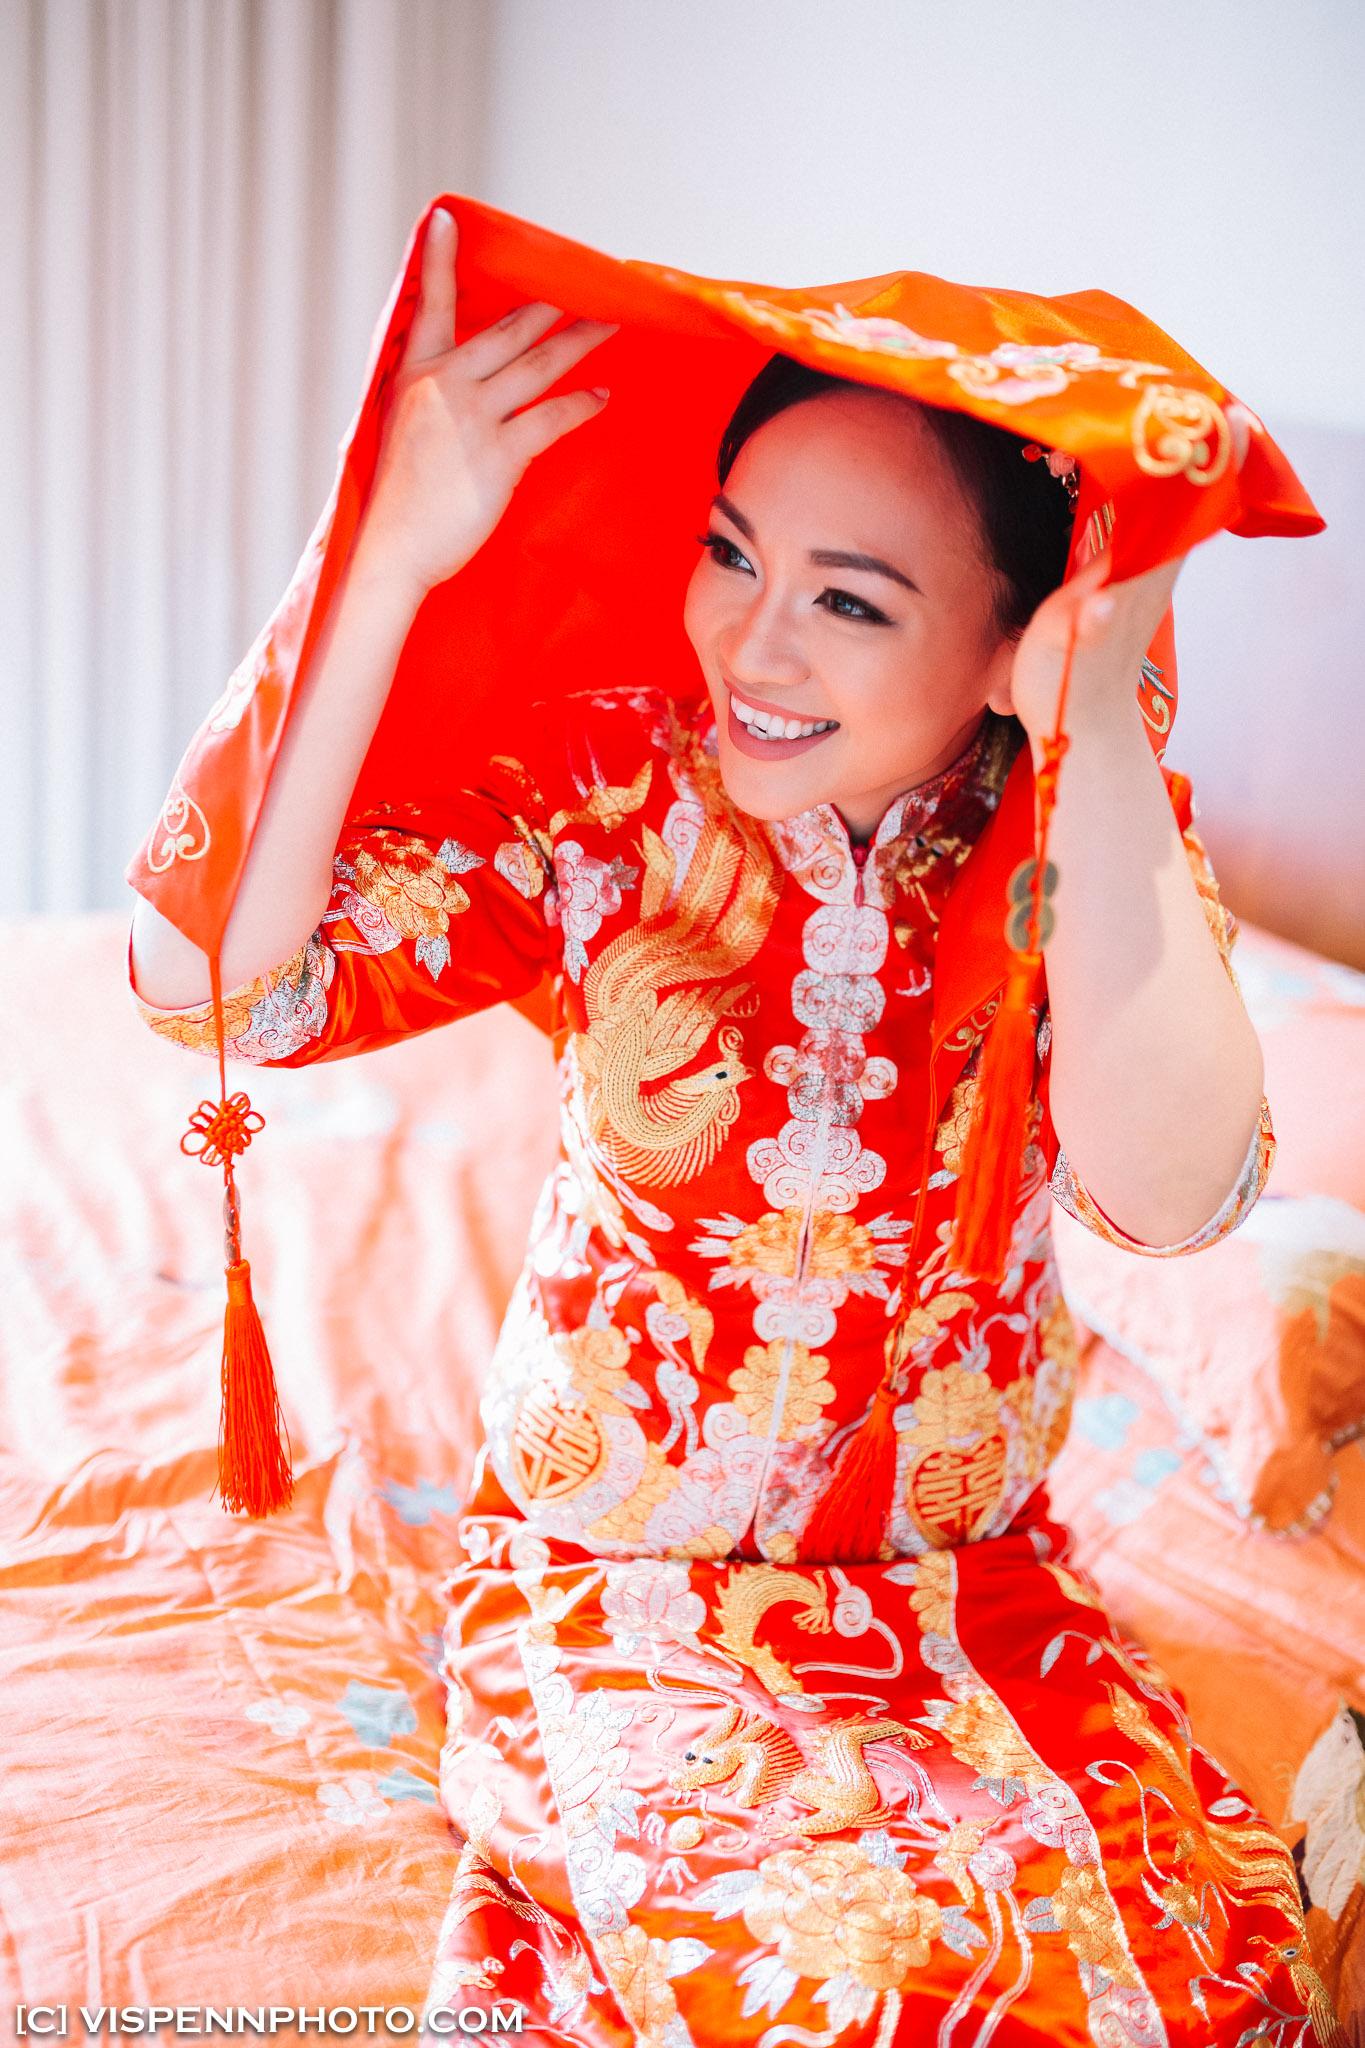 WEDDING DAY Photography Melbourne VISPENN 墨尔本 婚礼跟拍 婚礼摄像 婚礼摄影 结婚照 登记照 VISPENN Kat H1 00082